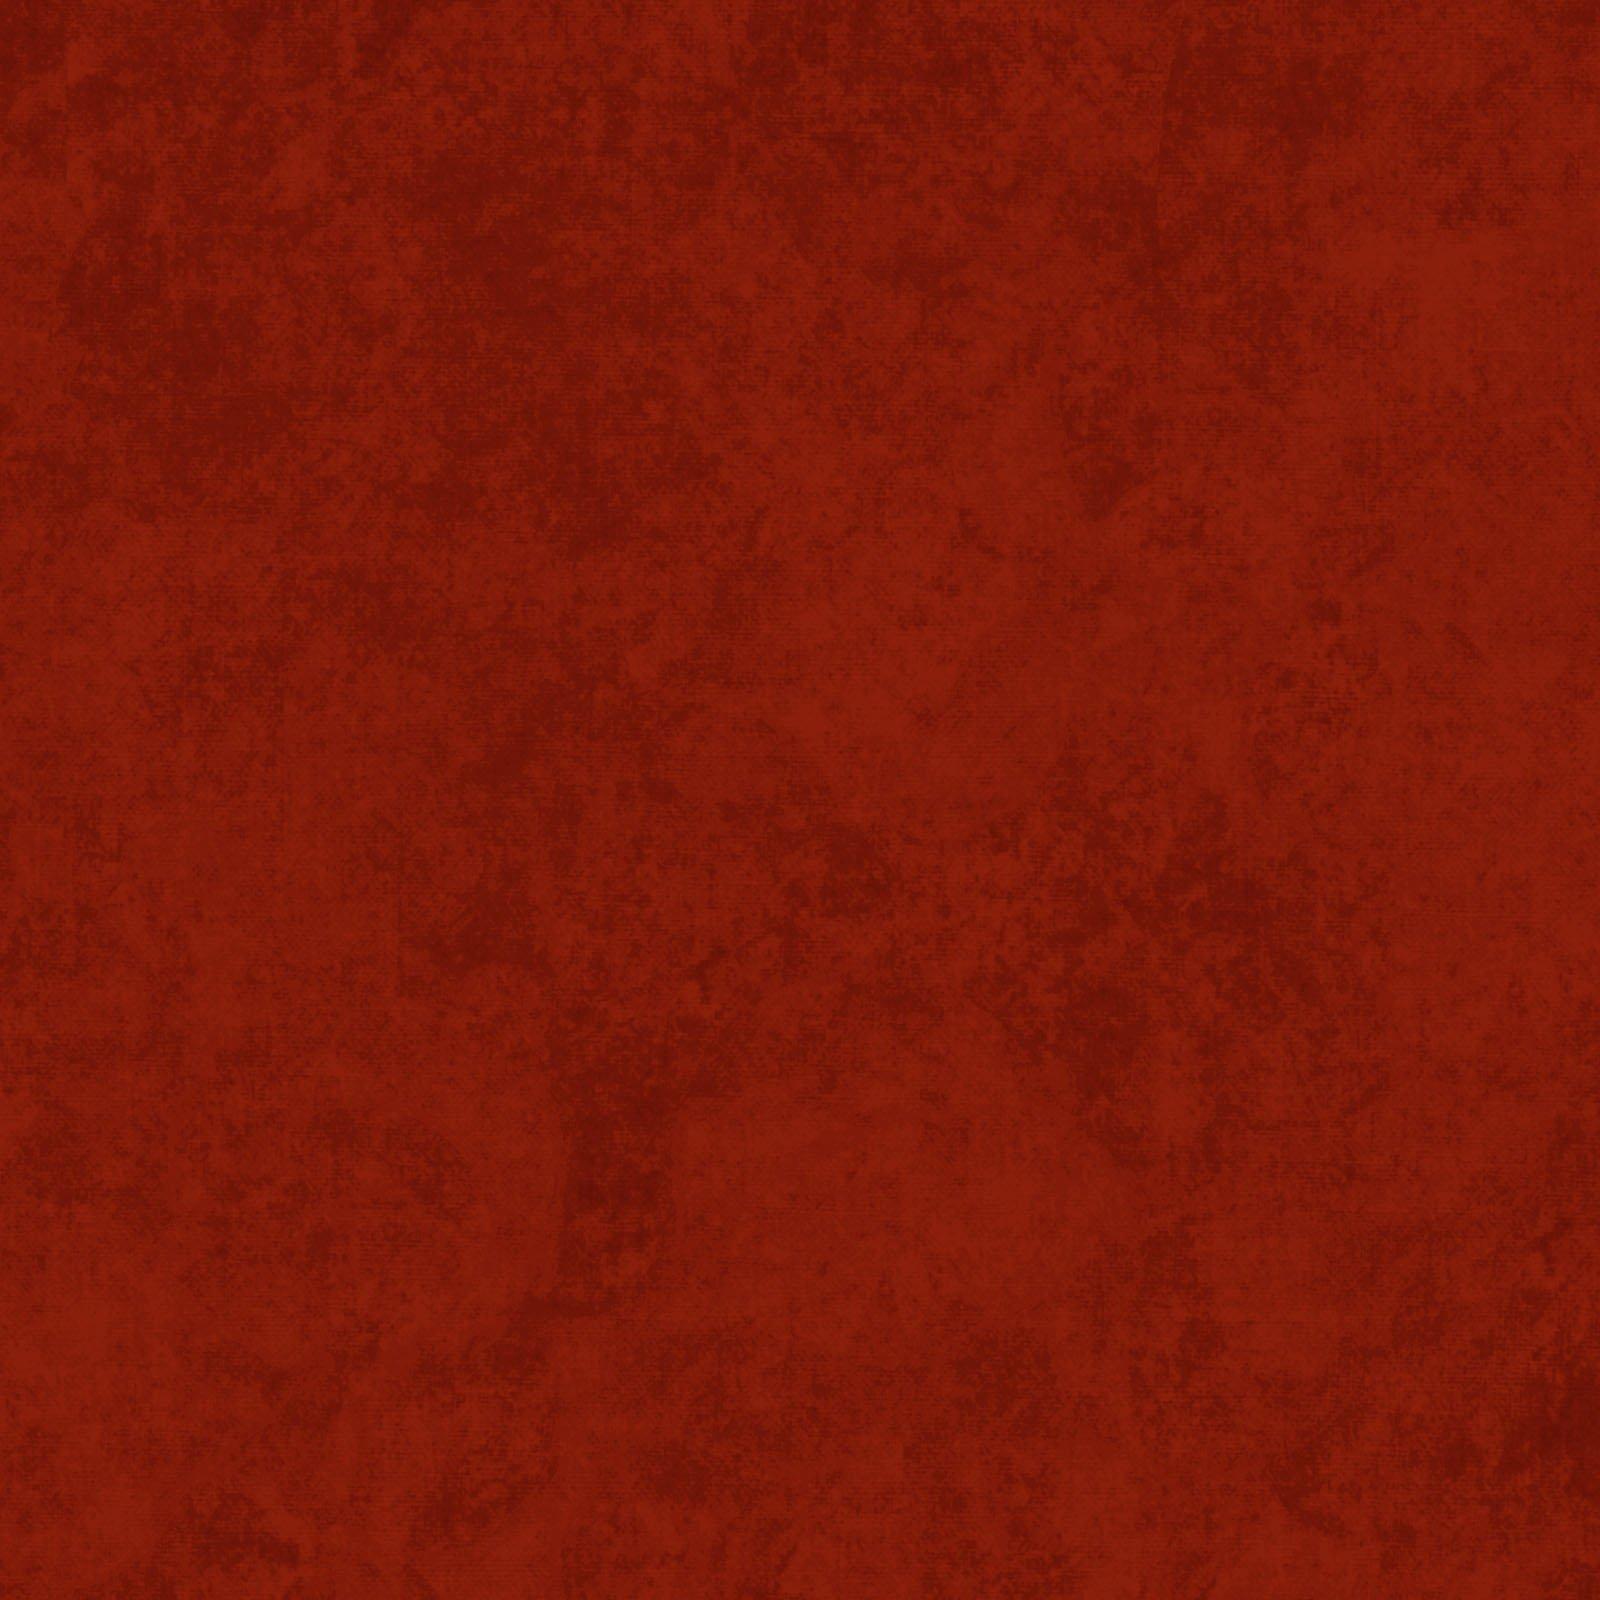 108 Beautiful Backing Red